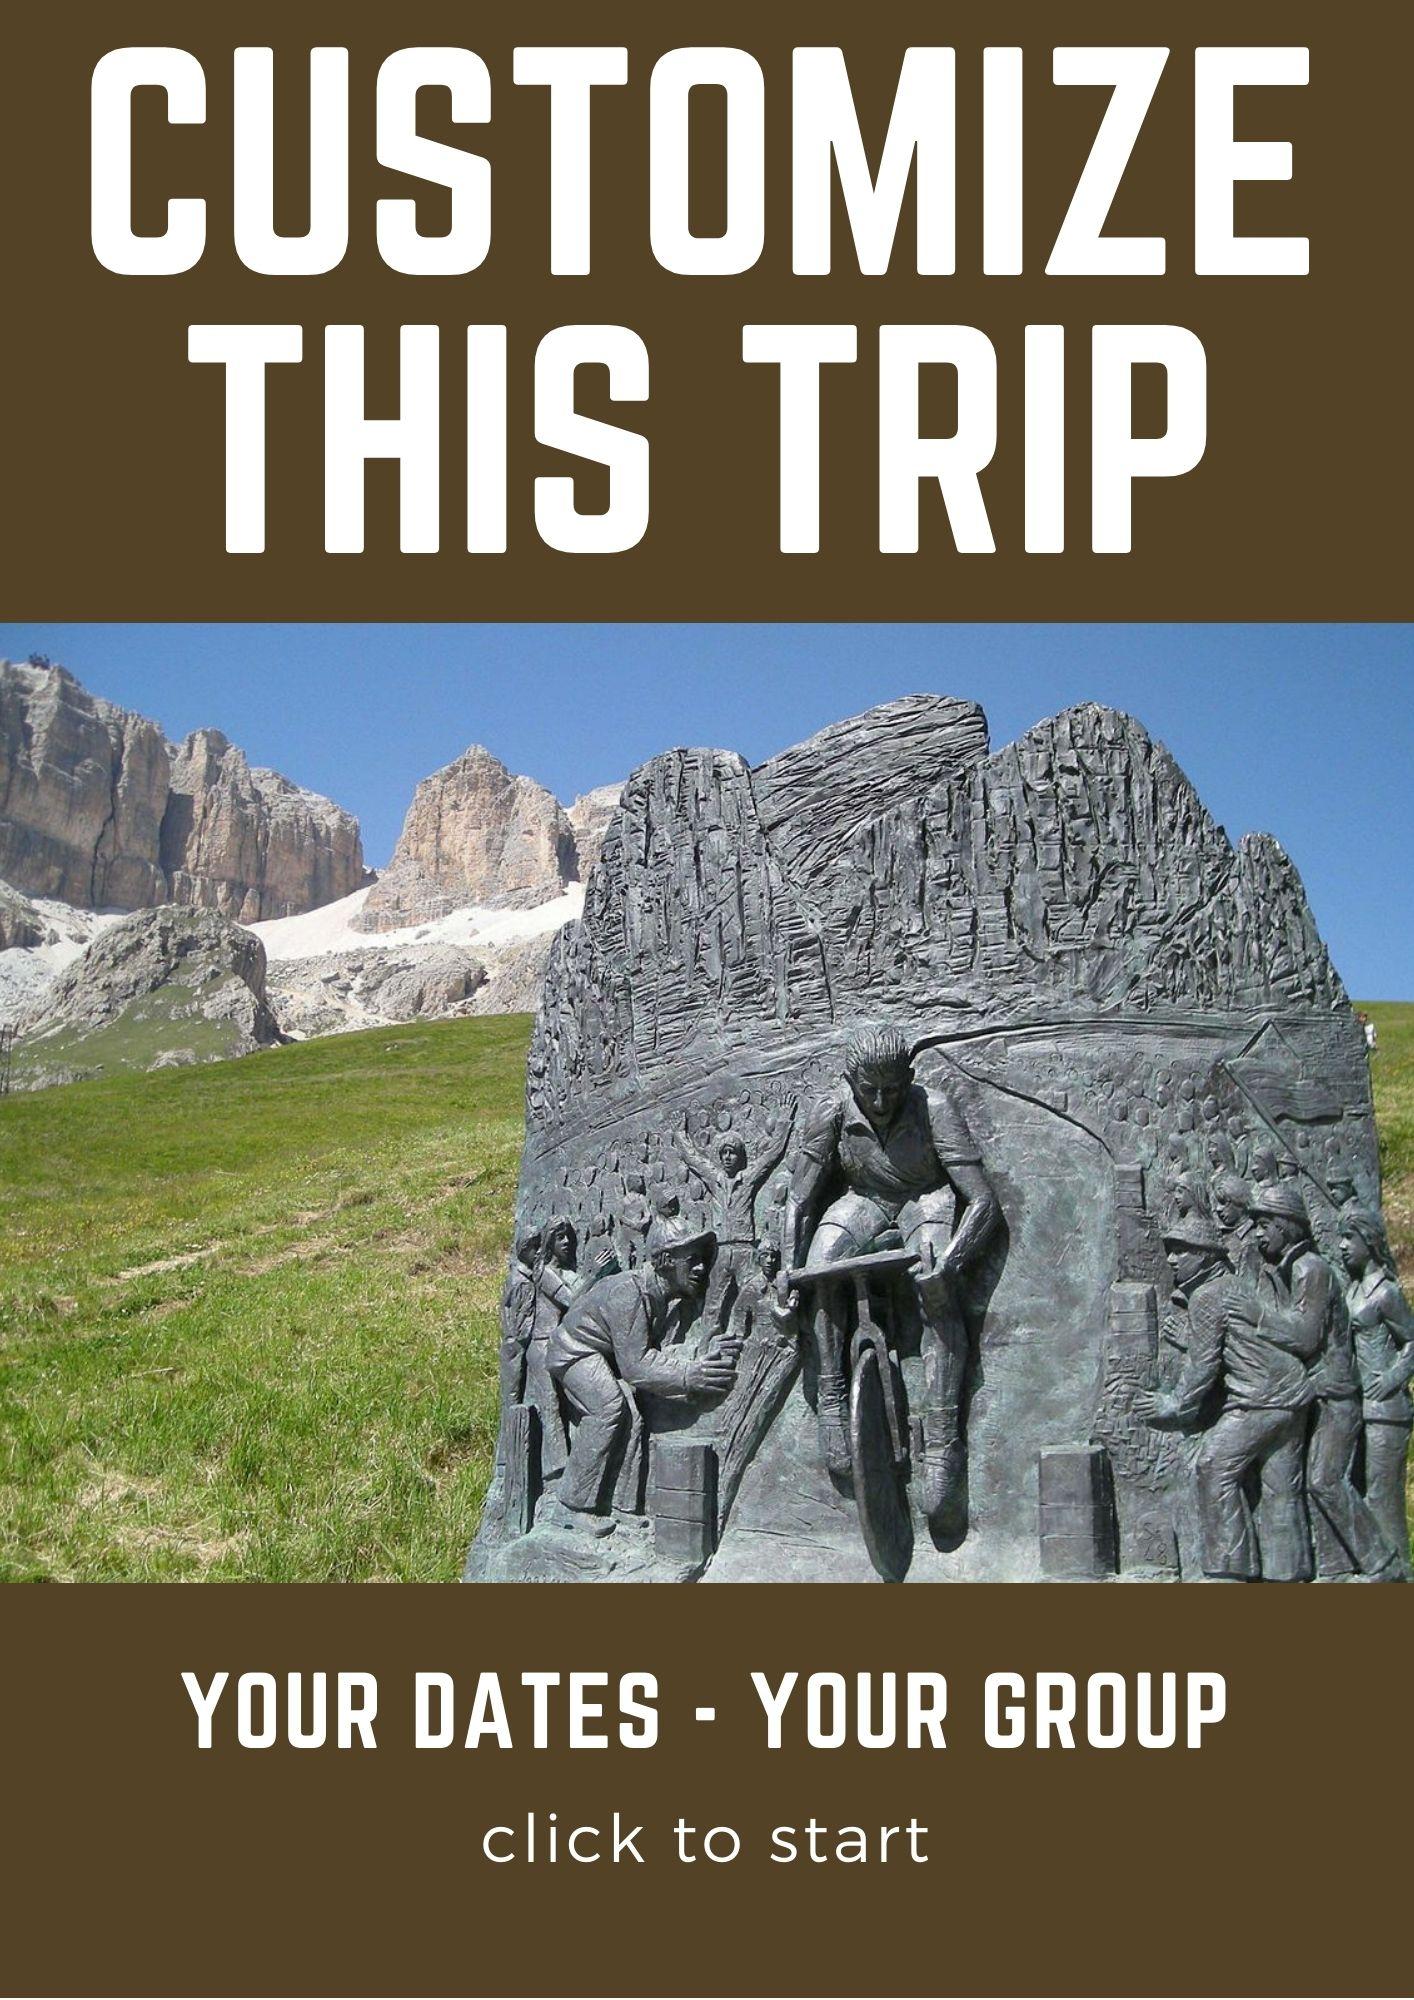 Customize this trip Dolomites